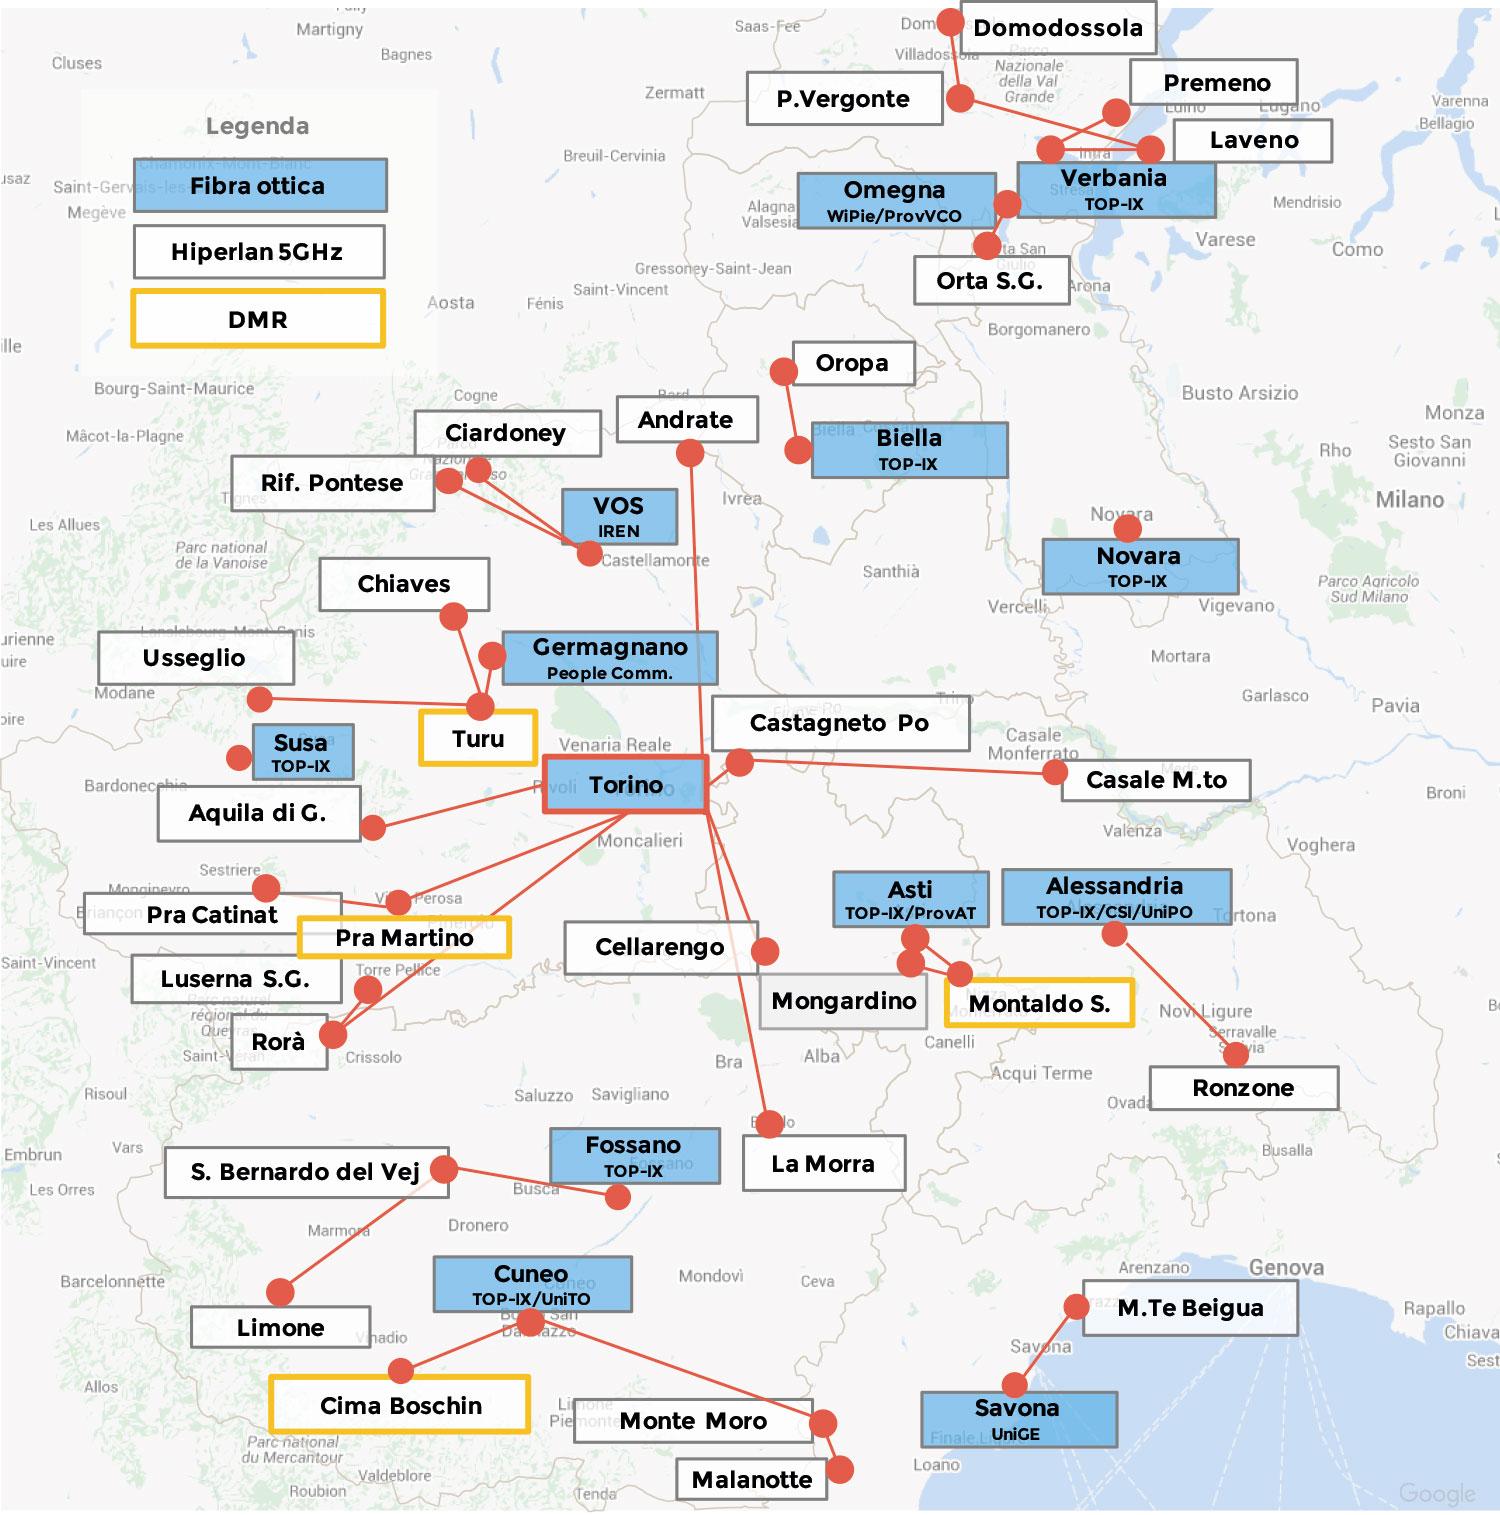 map_hpwnet